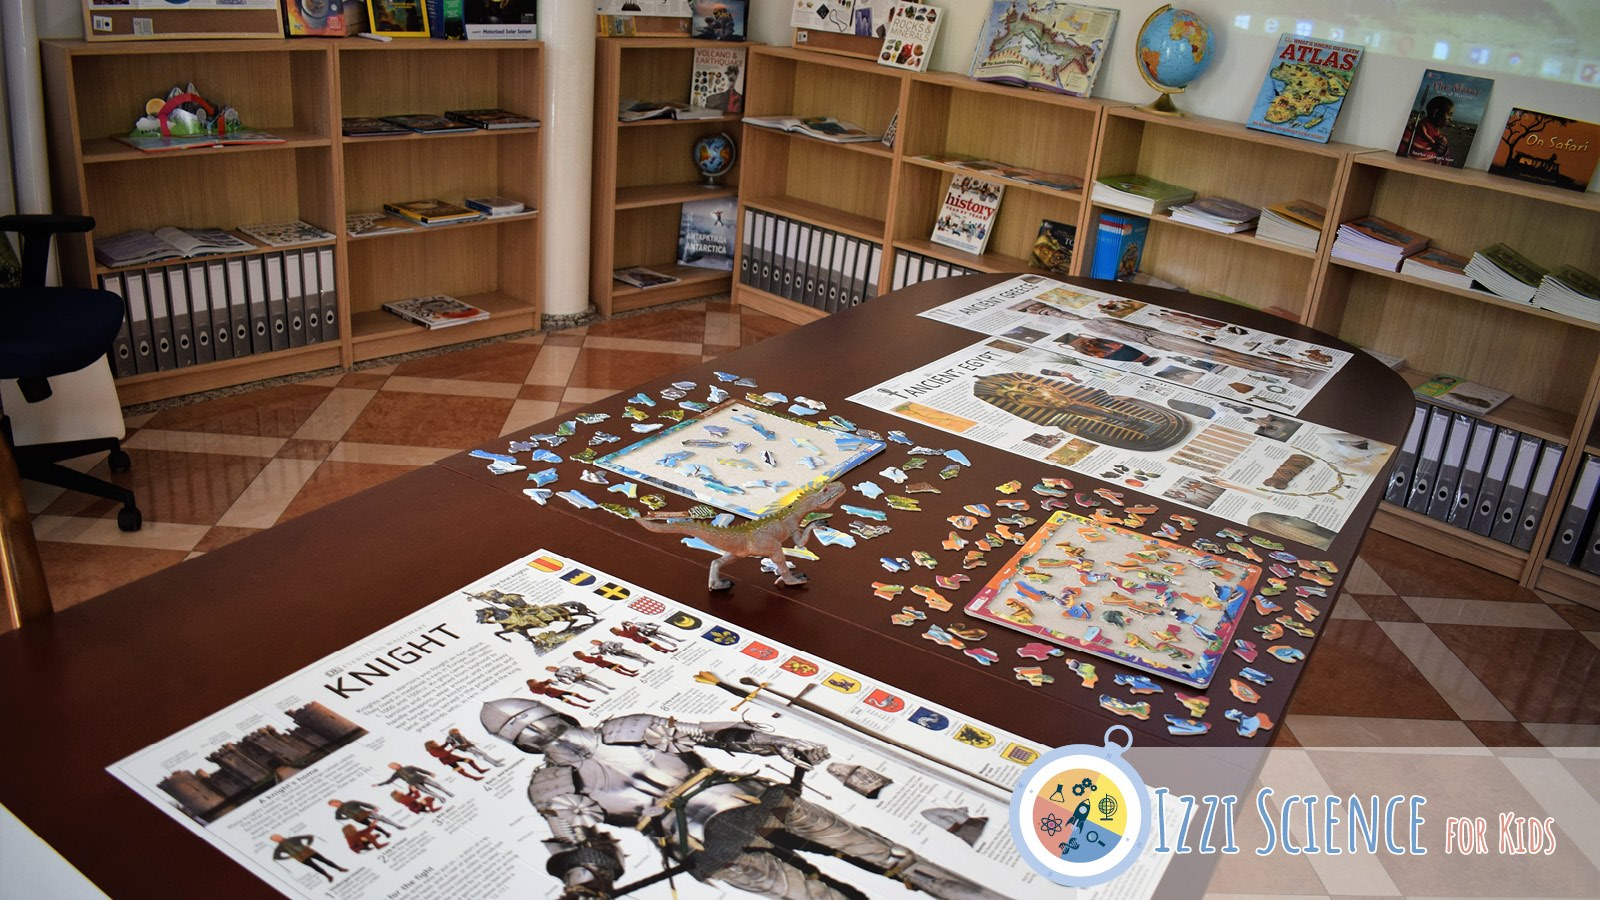 Частно начално училище Izzi Science for Kids кабинет по география